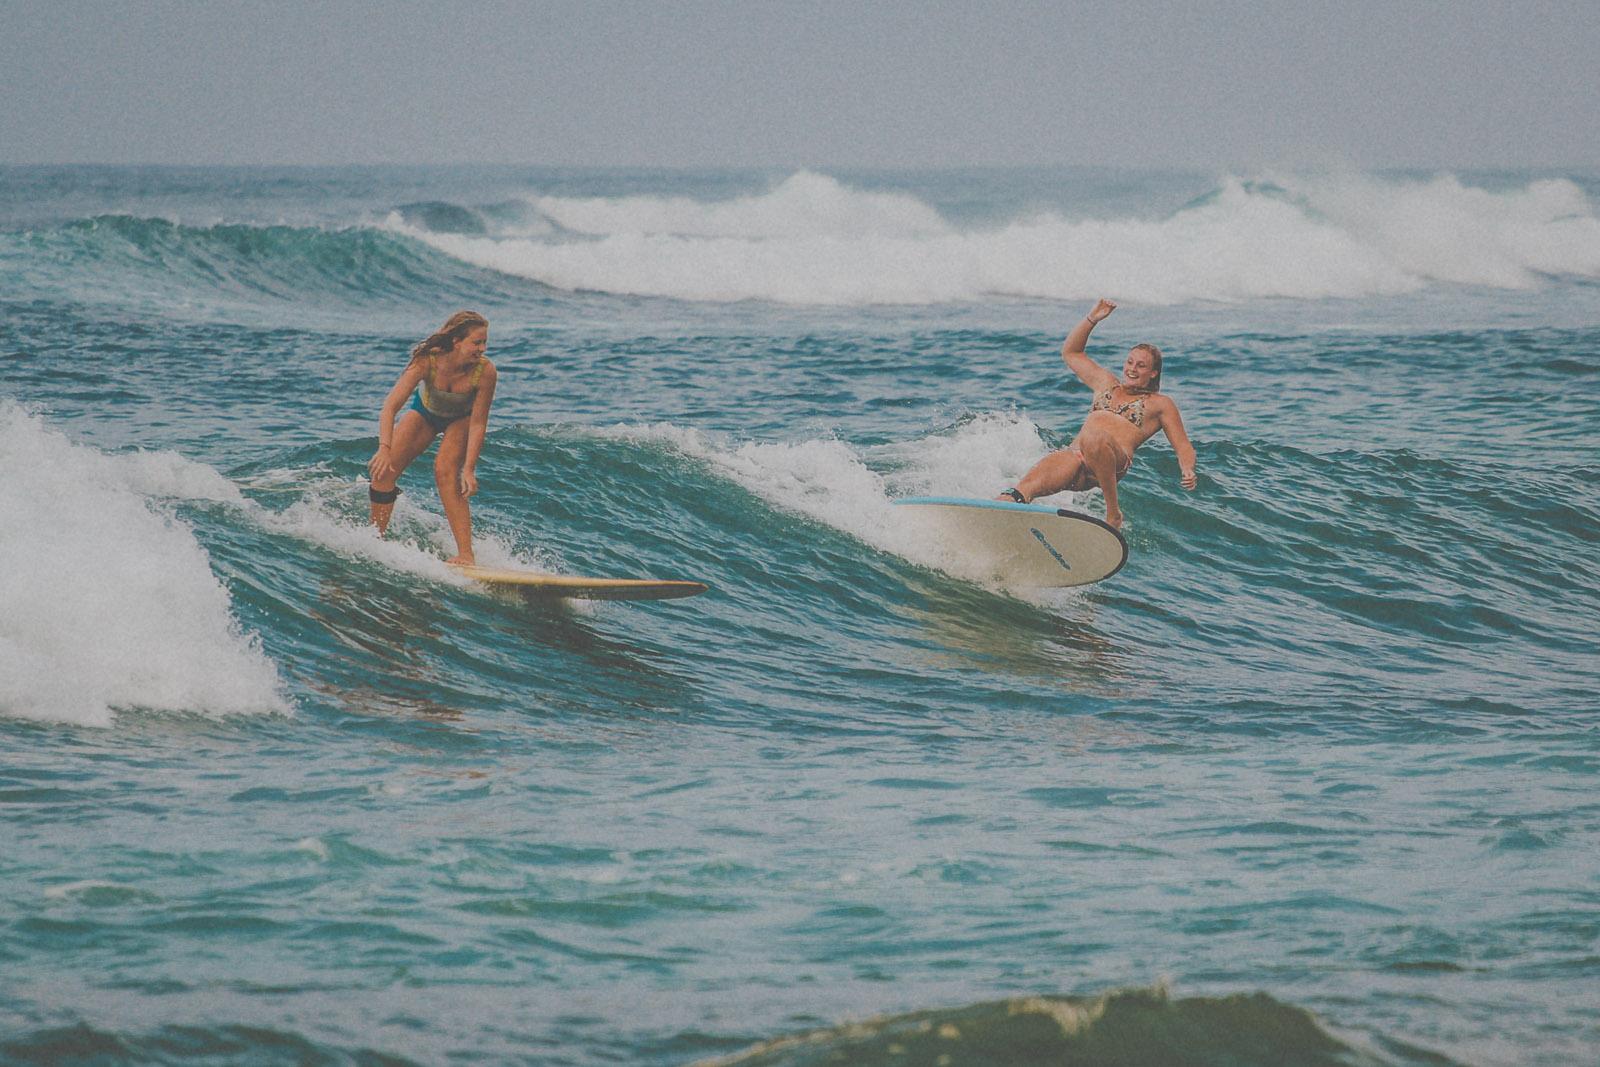 Sri Lanka-Lazy Left-Rams-Midigama-Surfing-Surf-Wave-Pointbreak-Longboard-Sunshinestories-IMG_4197